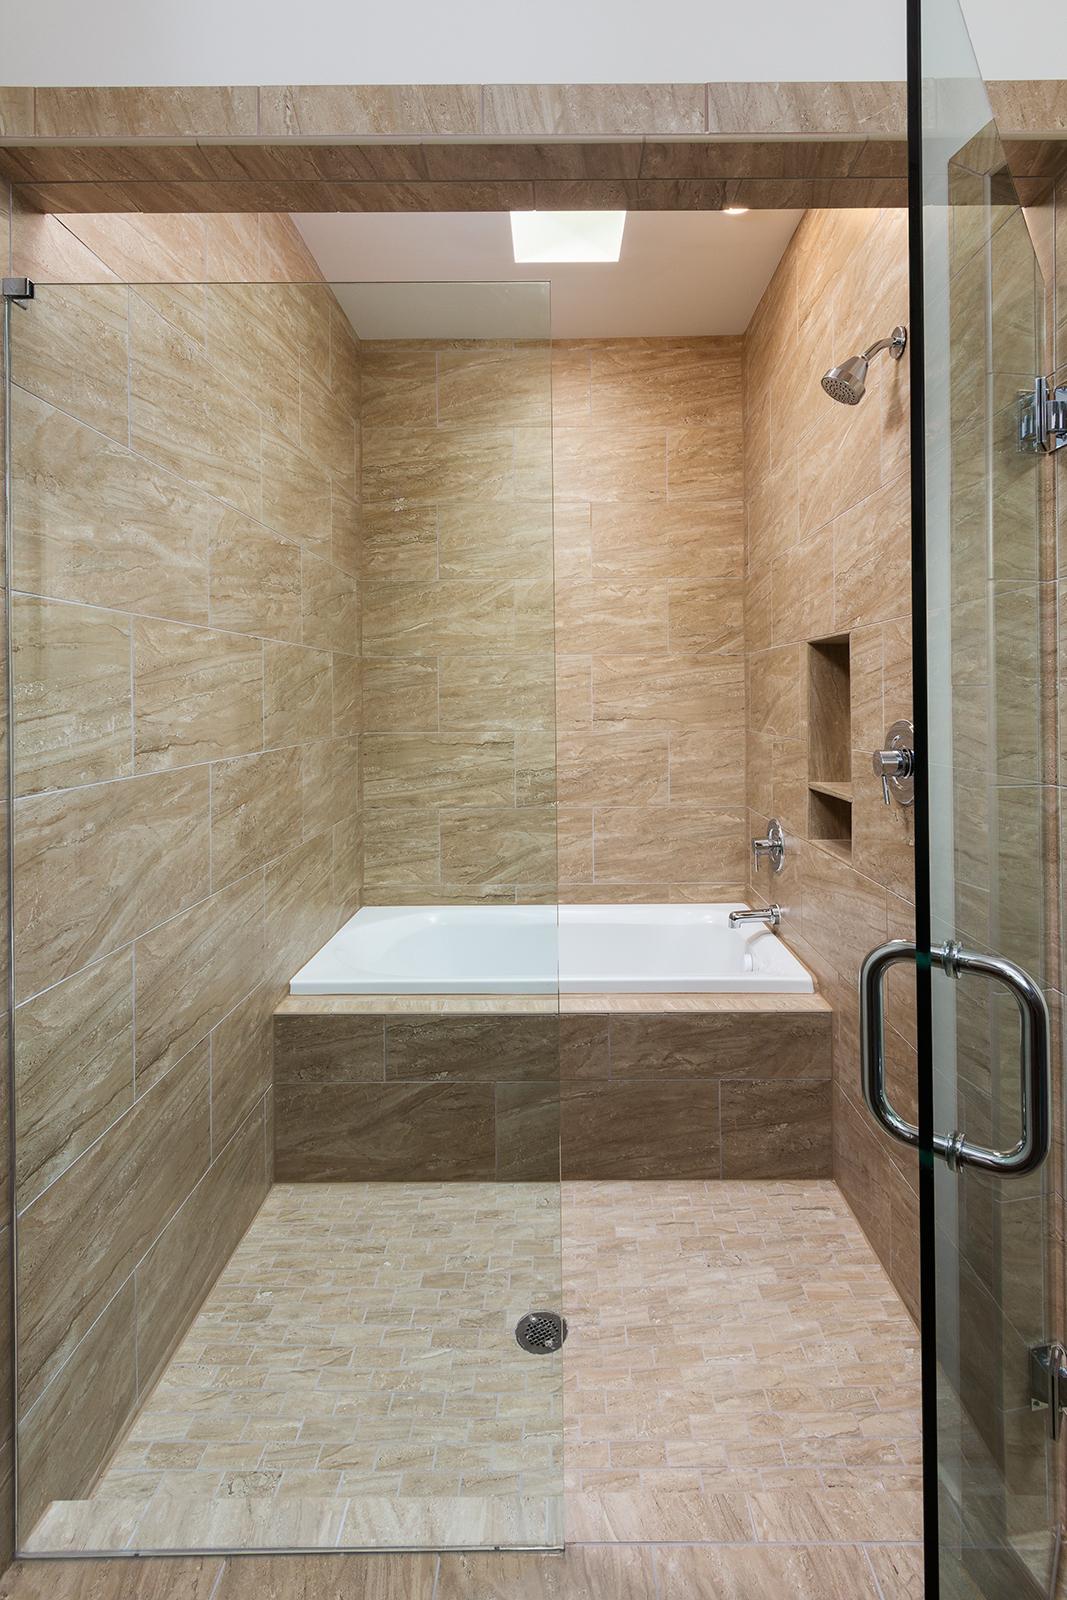 084 1309 Axis_Master Bathroom Shower.jpg